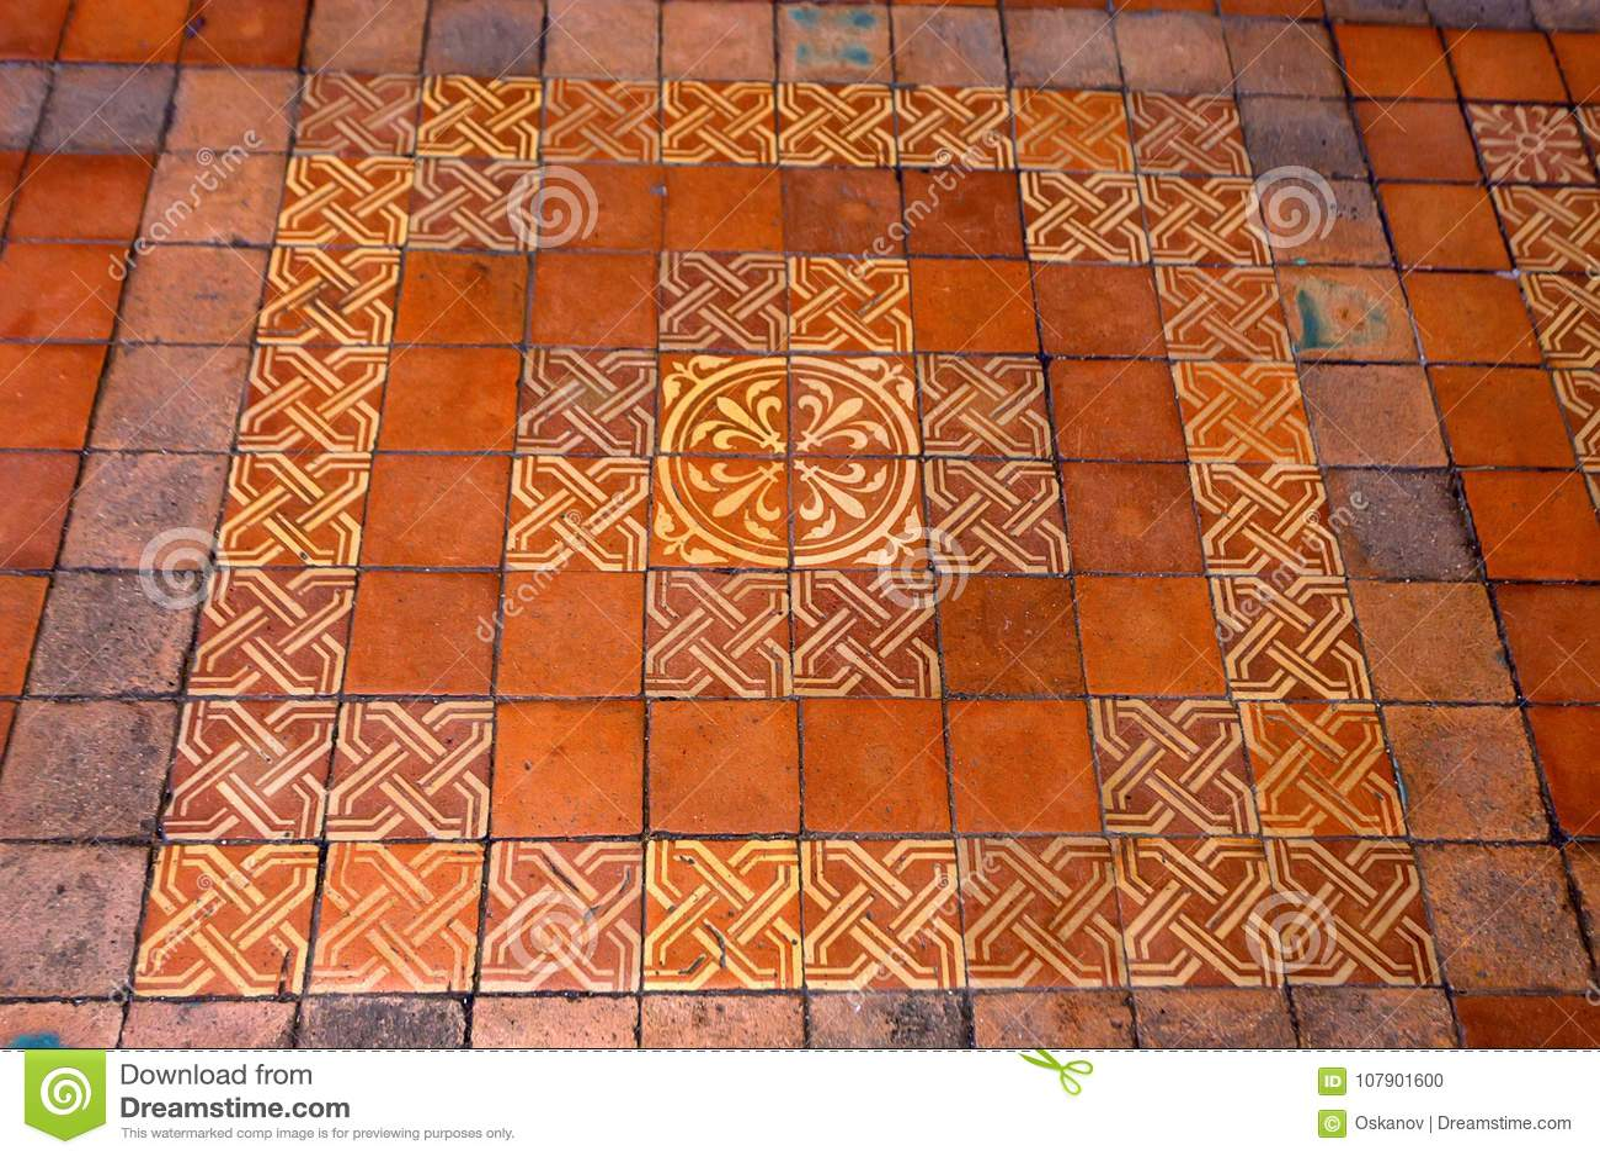 Blois francia circa giugno 2014: piastrella per pavimento